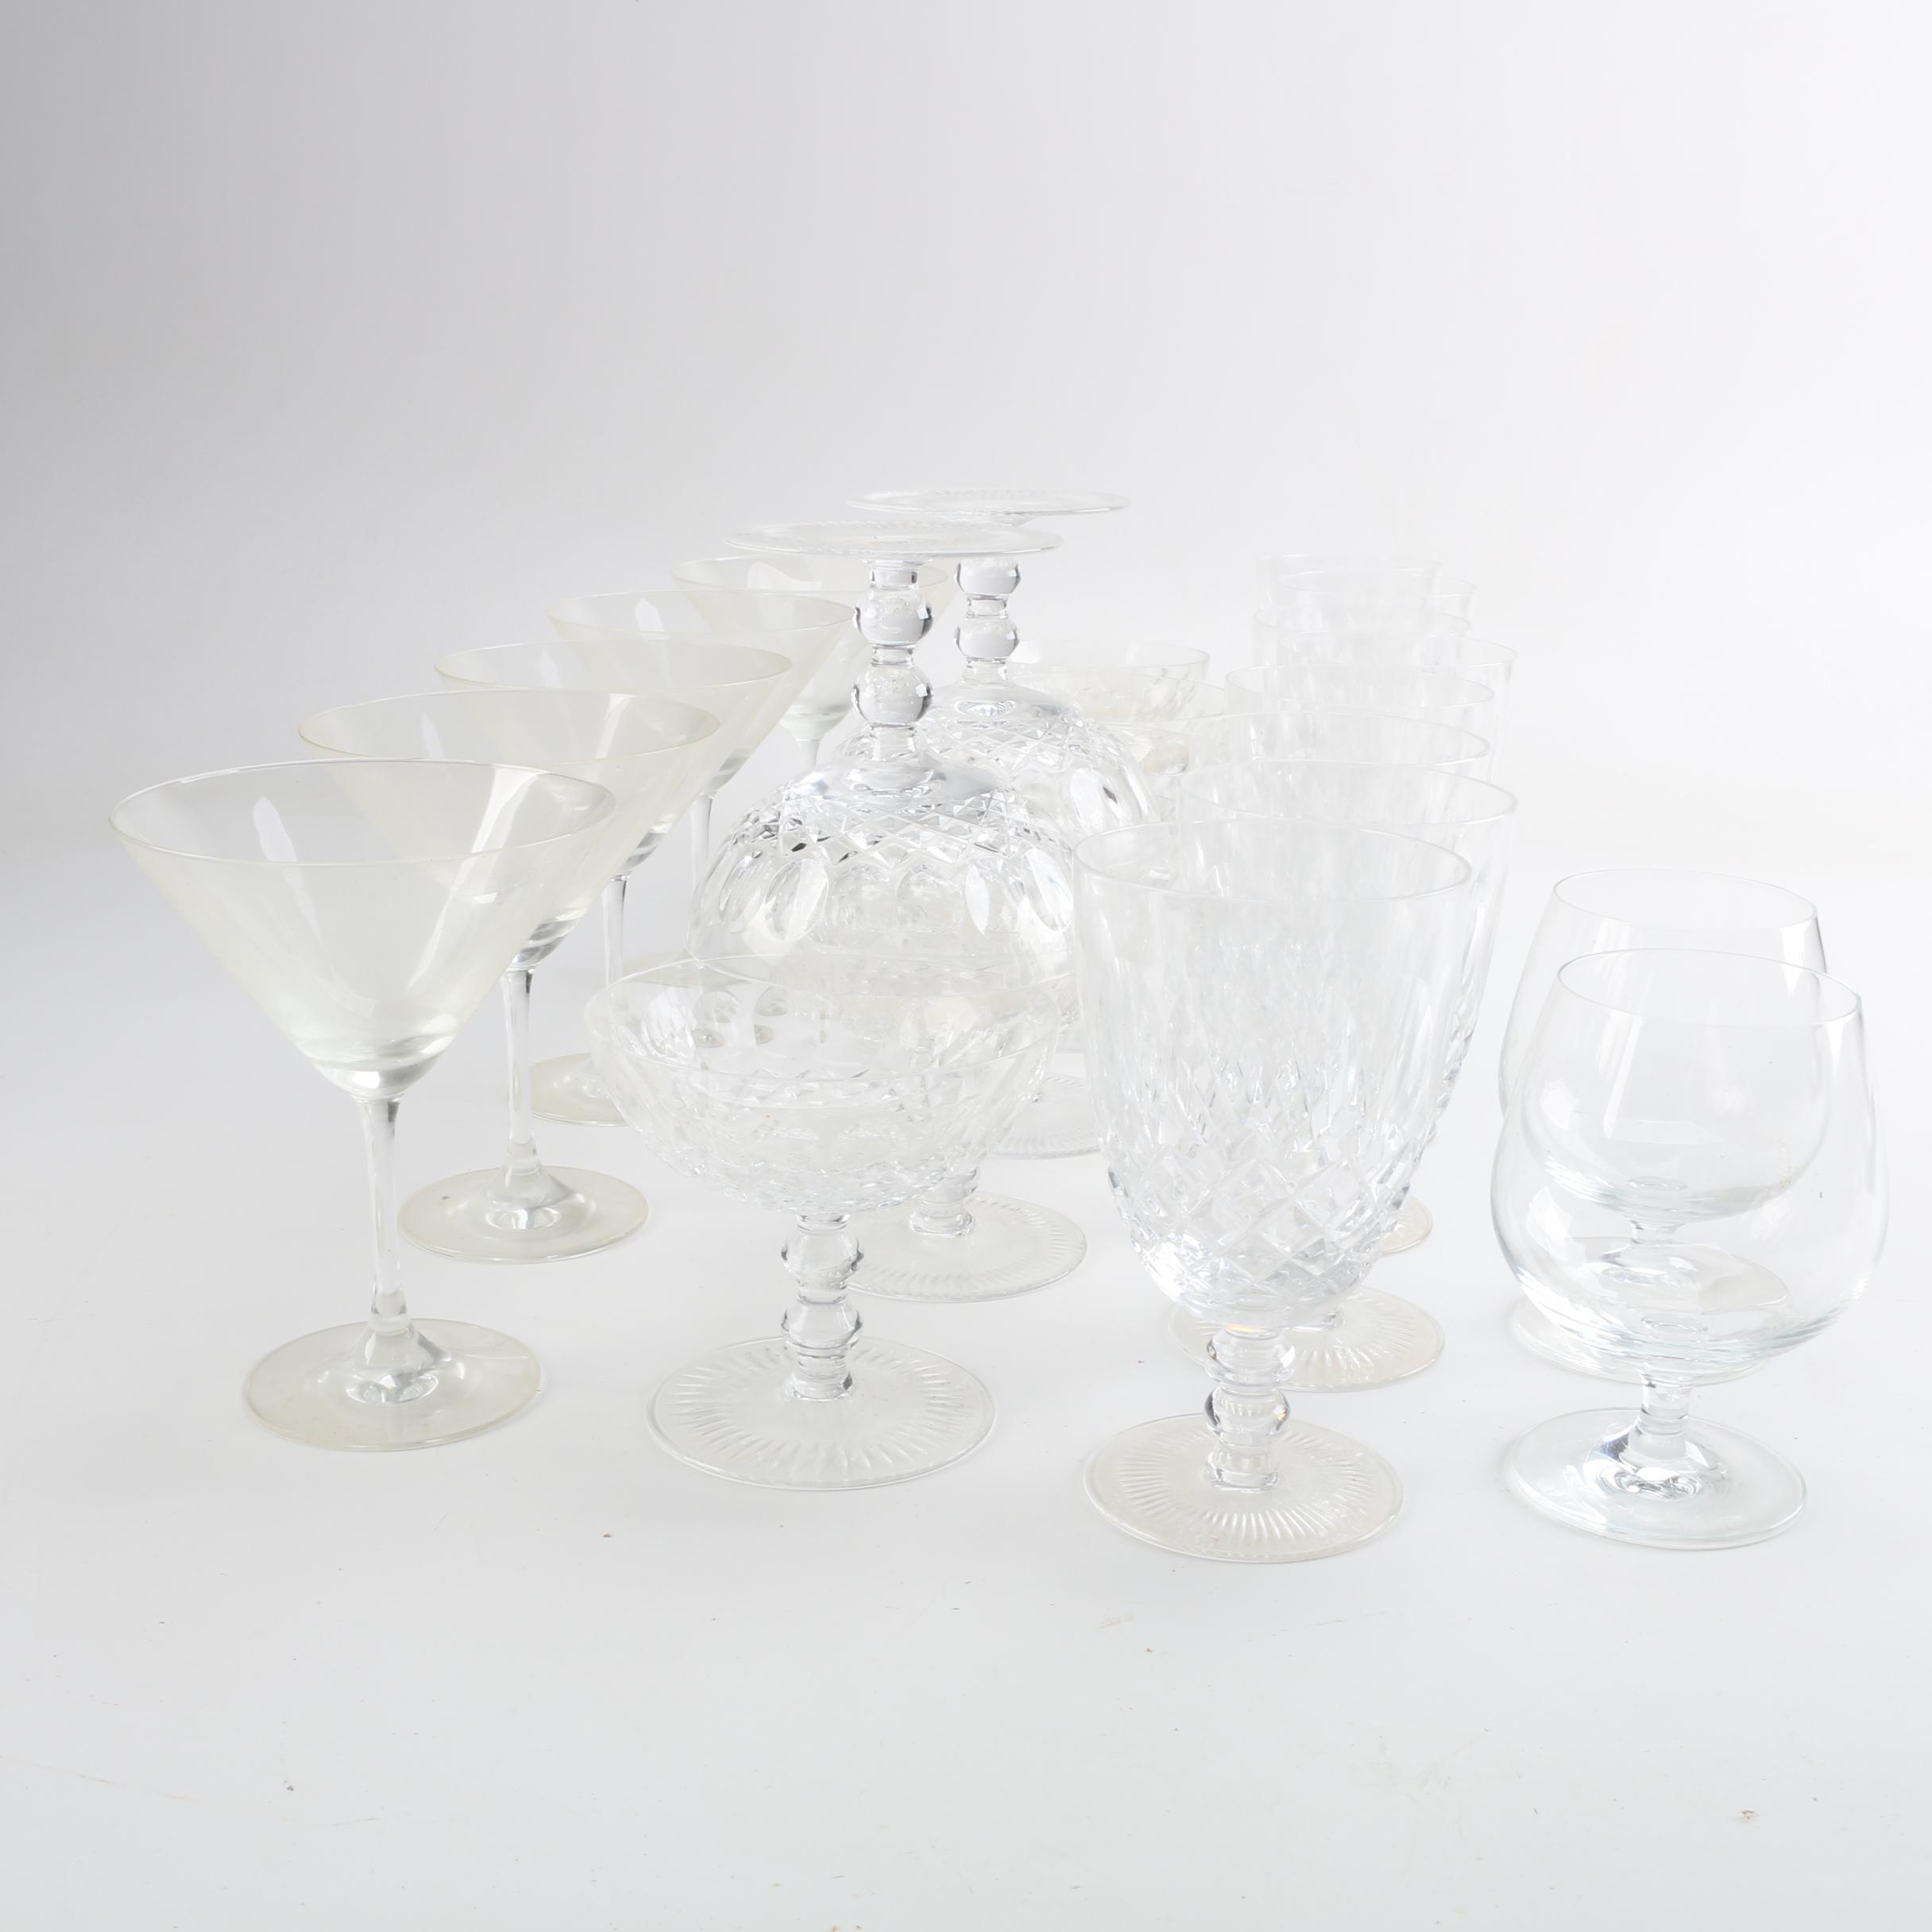 Glass Stemware of Various Styles